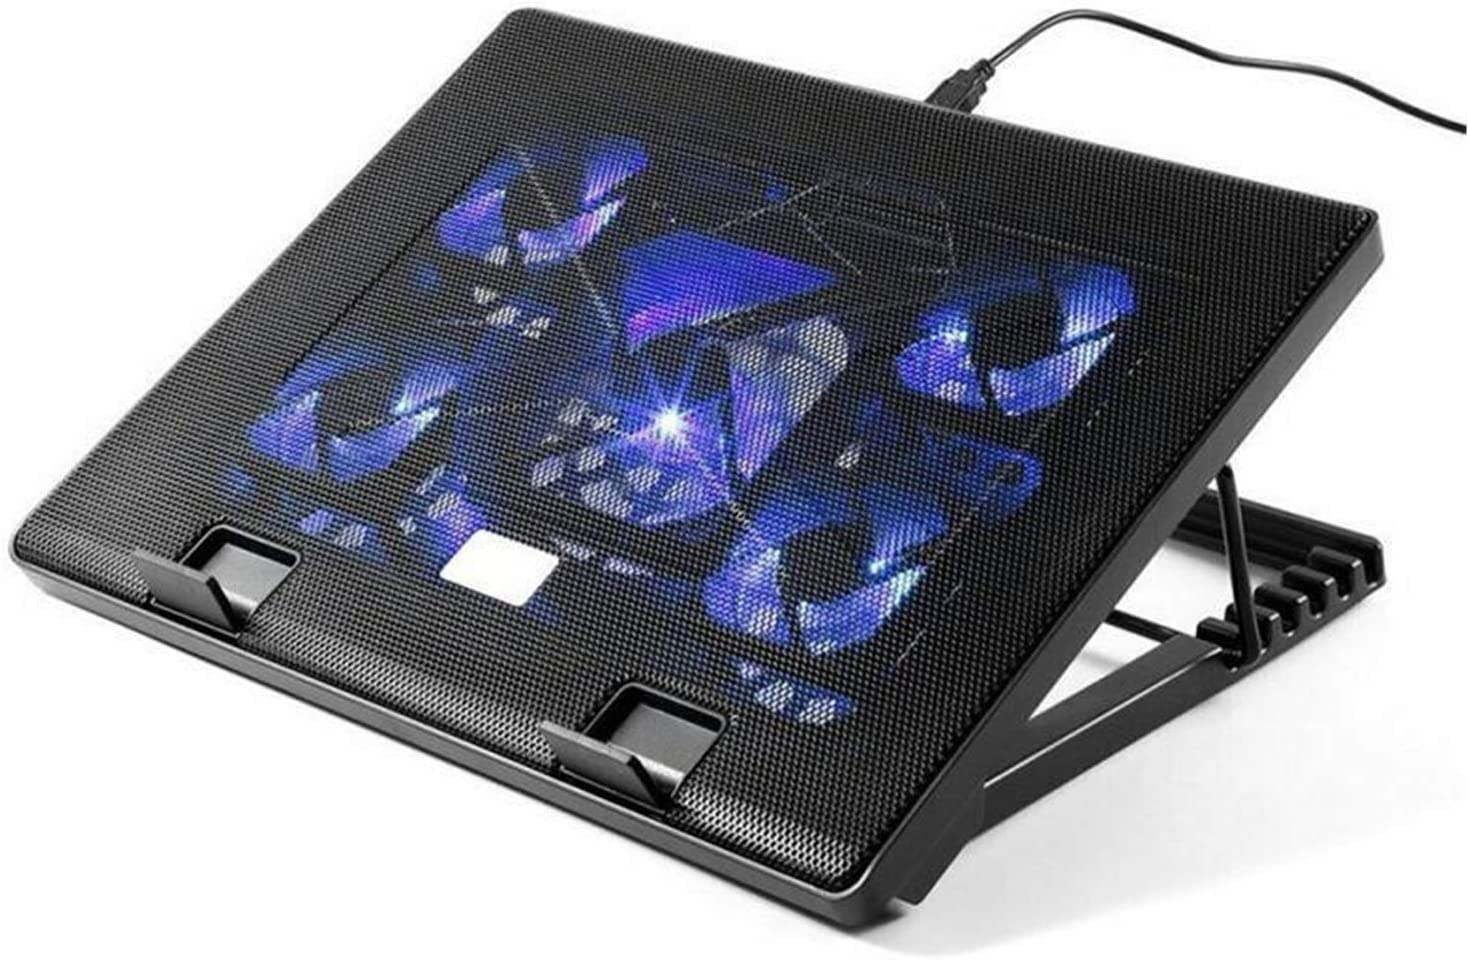 Our shop 5 ☆ popular most popular DONCK Computer Radiator Fan Game Laptop Inch 15.6-17 Cooler Note